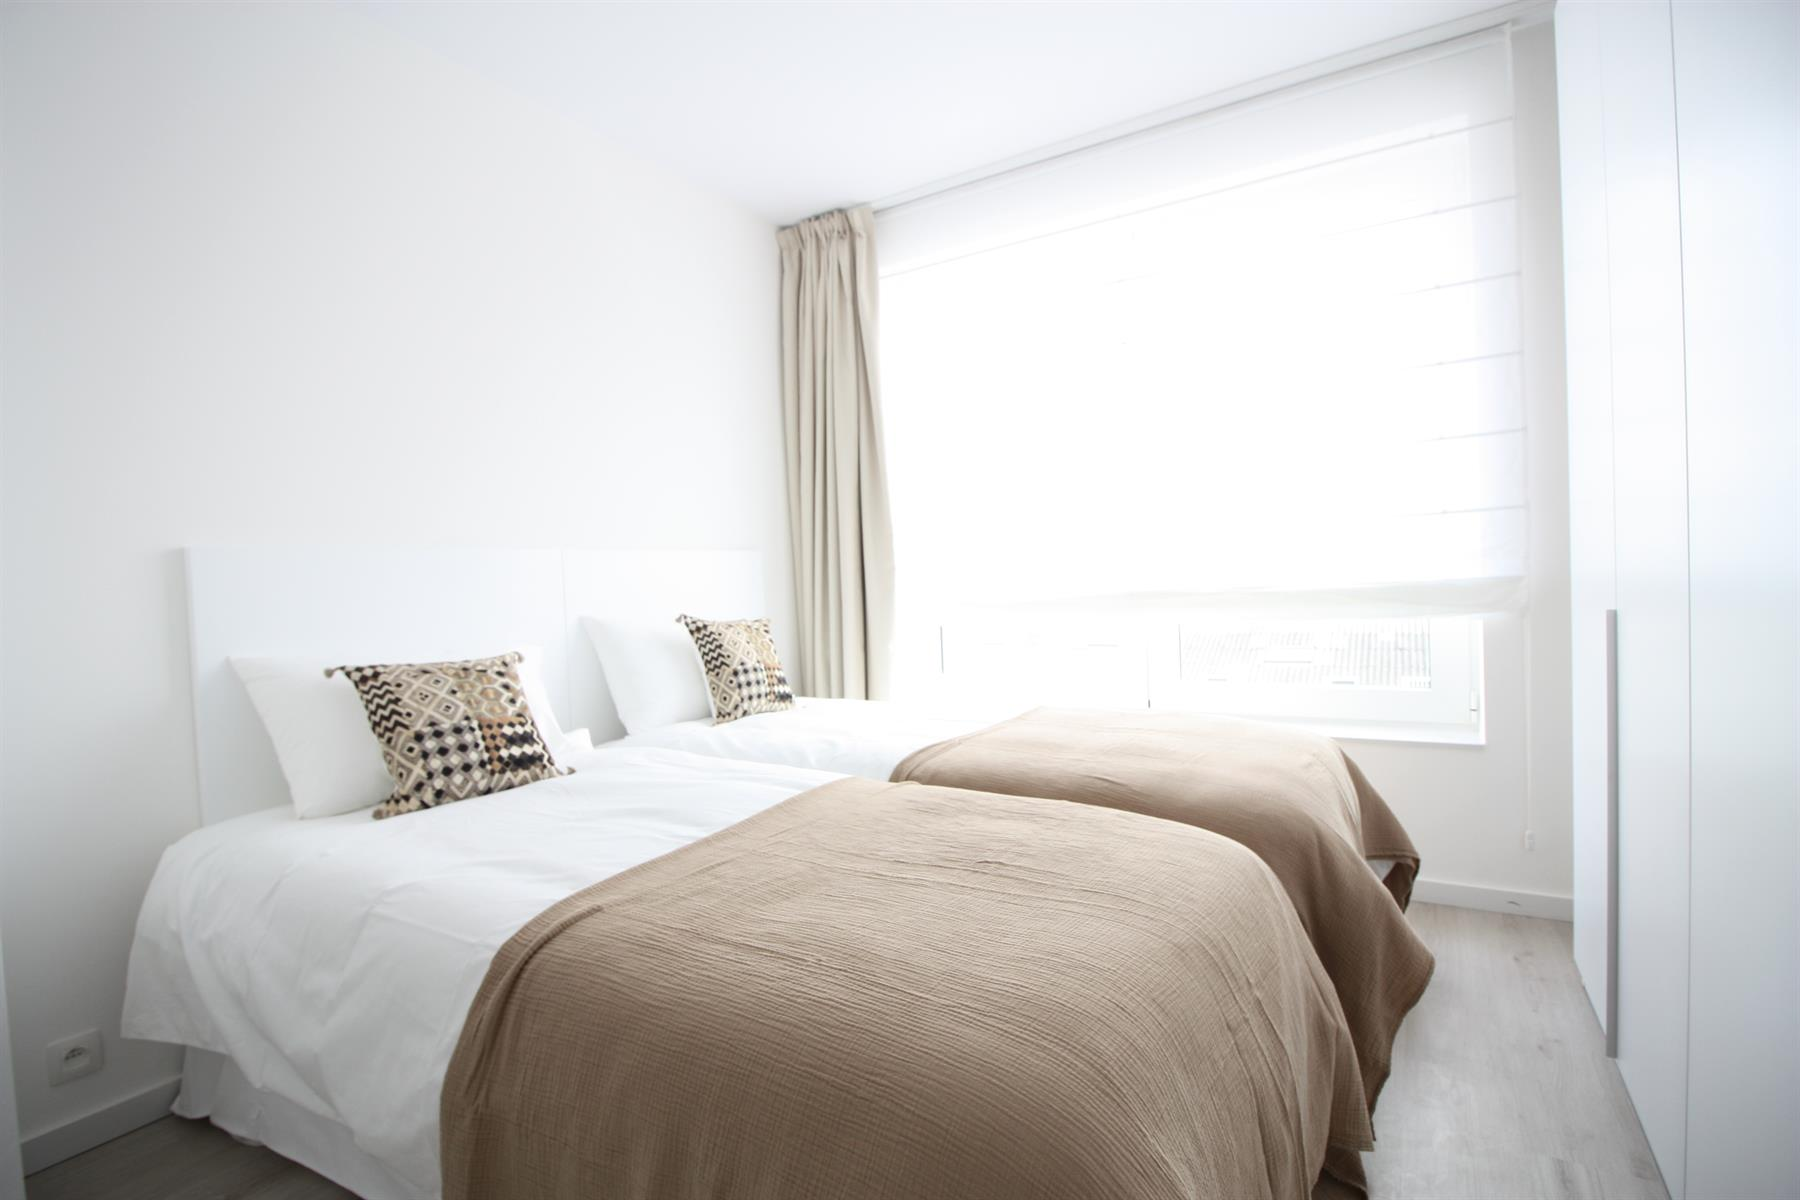 Appartement - Woluwe-Saint-Lambert - #4395355-13